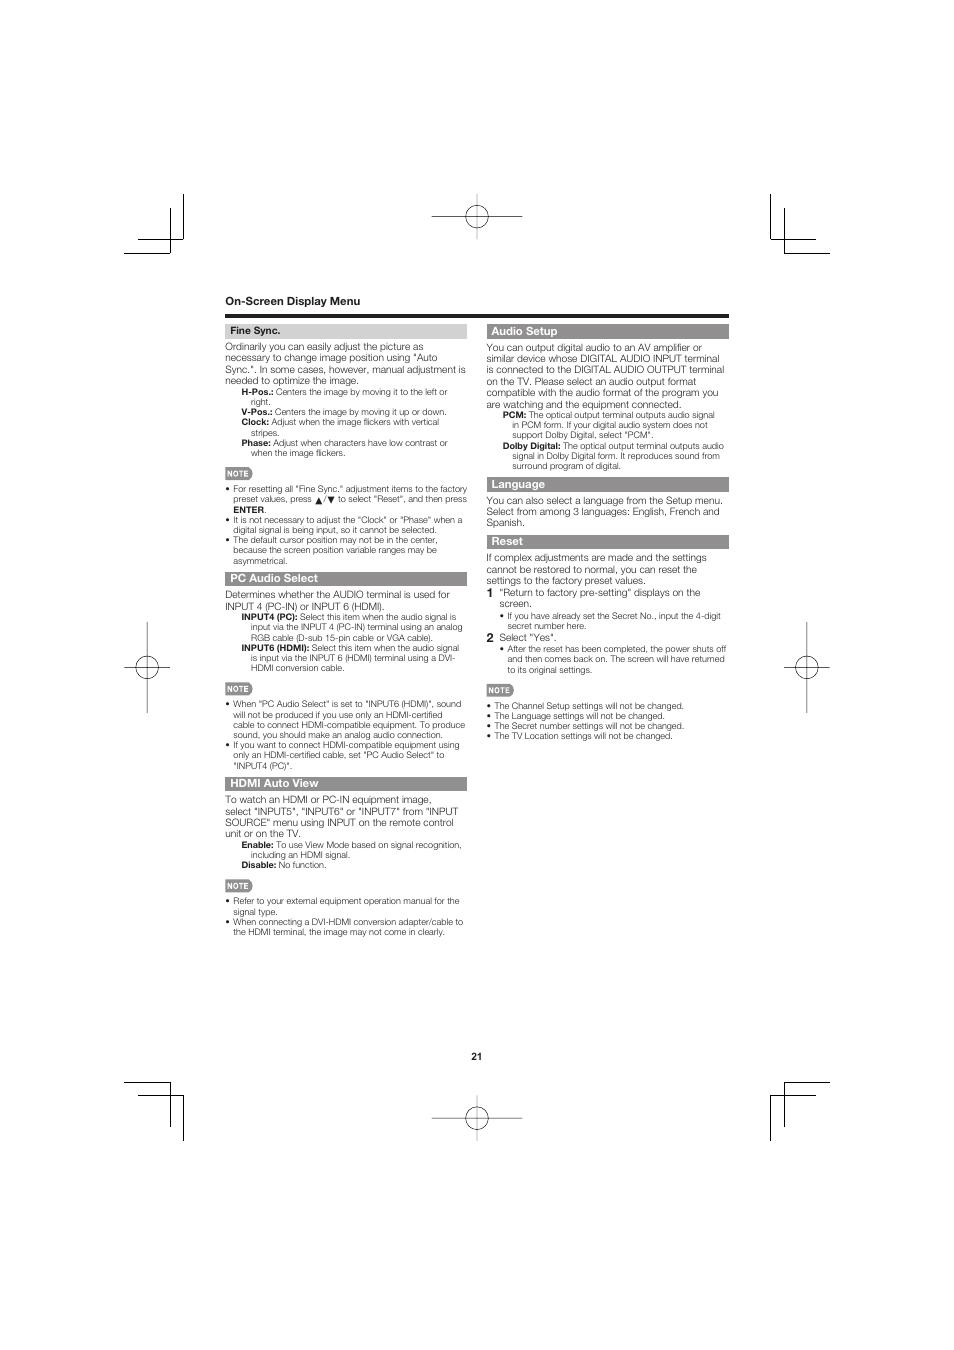 Pc audio select, Hdmi auto view, Audio setup | Sharp AQUOS